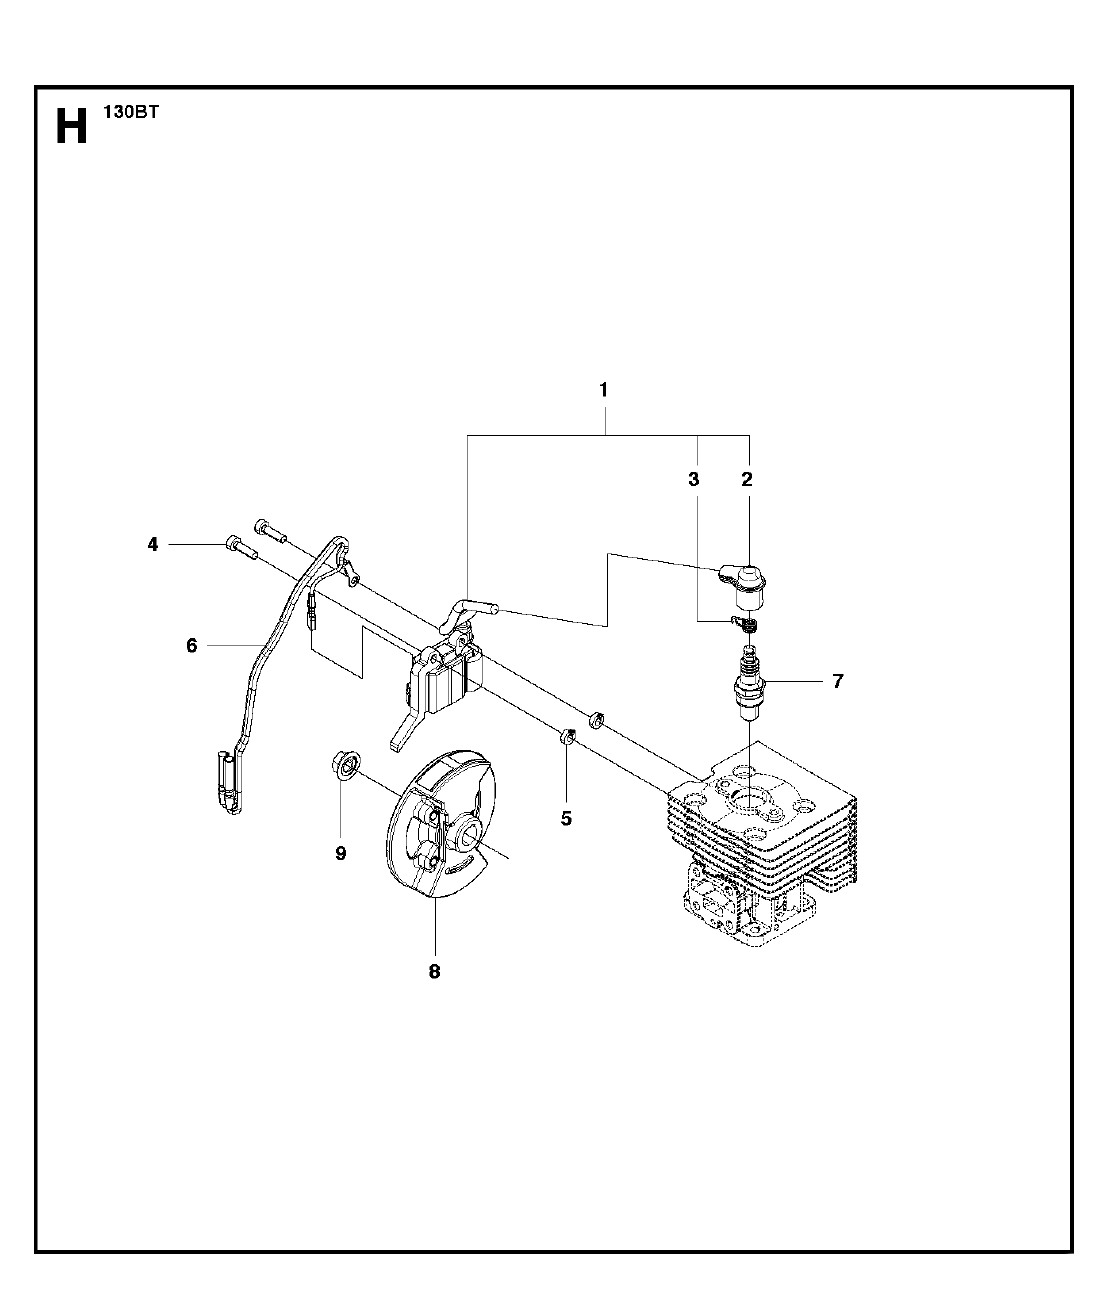 Buy Husqvarna 130bt Type 1 Replacement Tool Parts